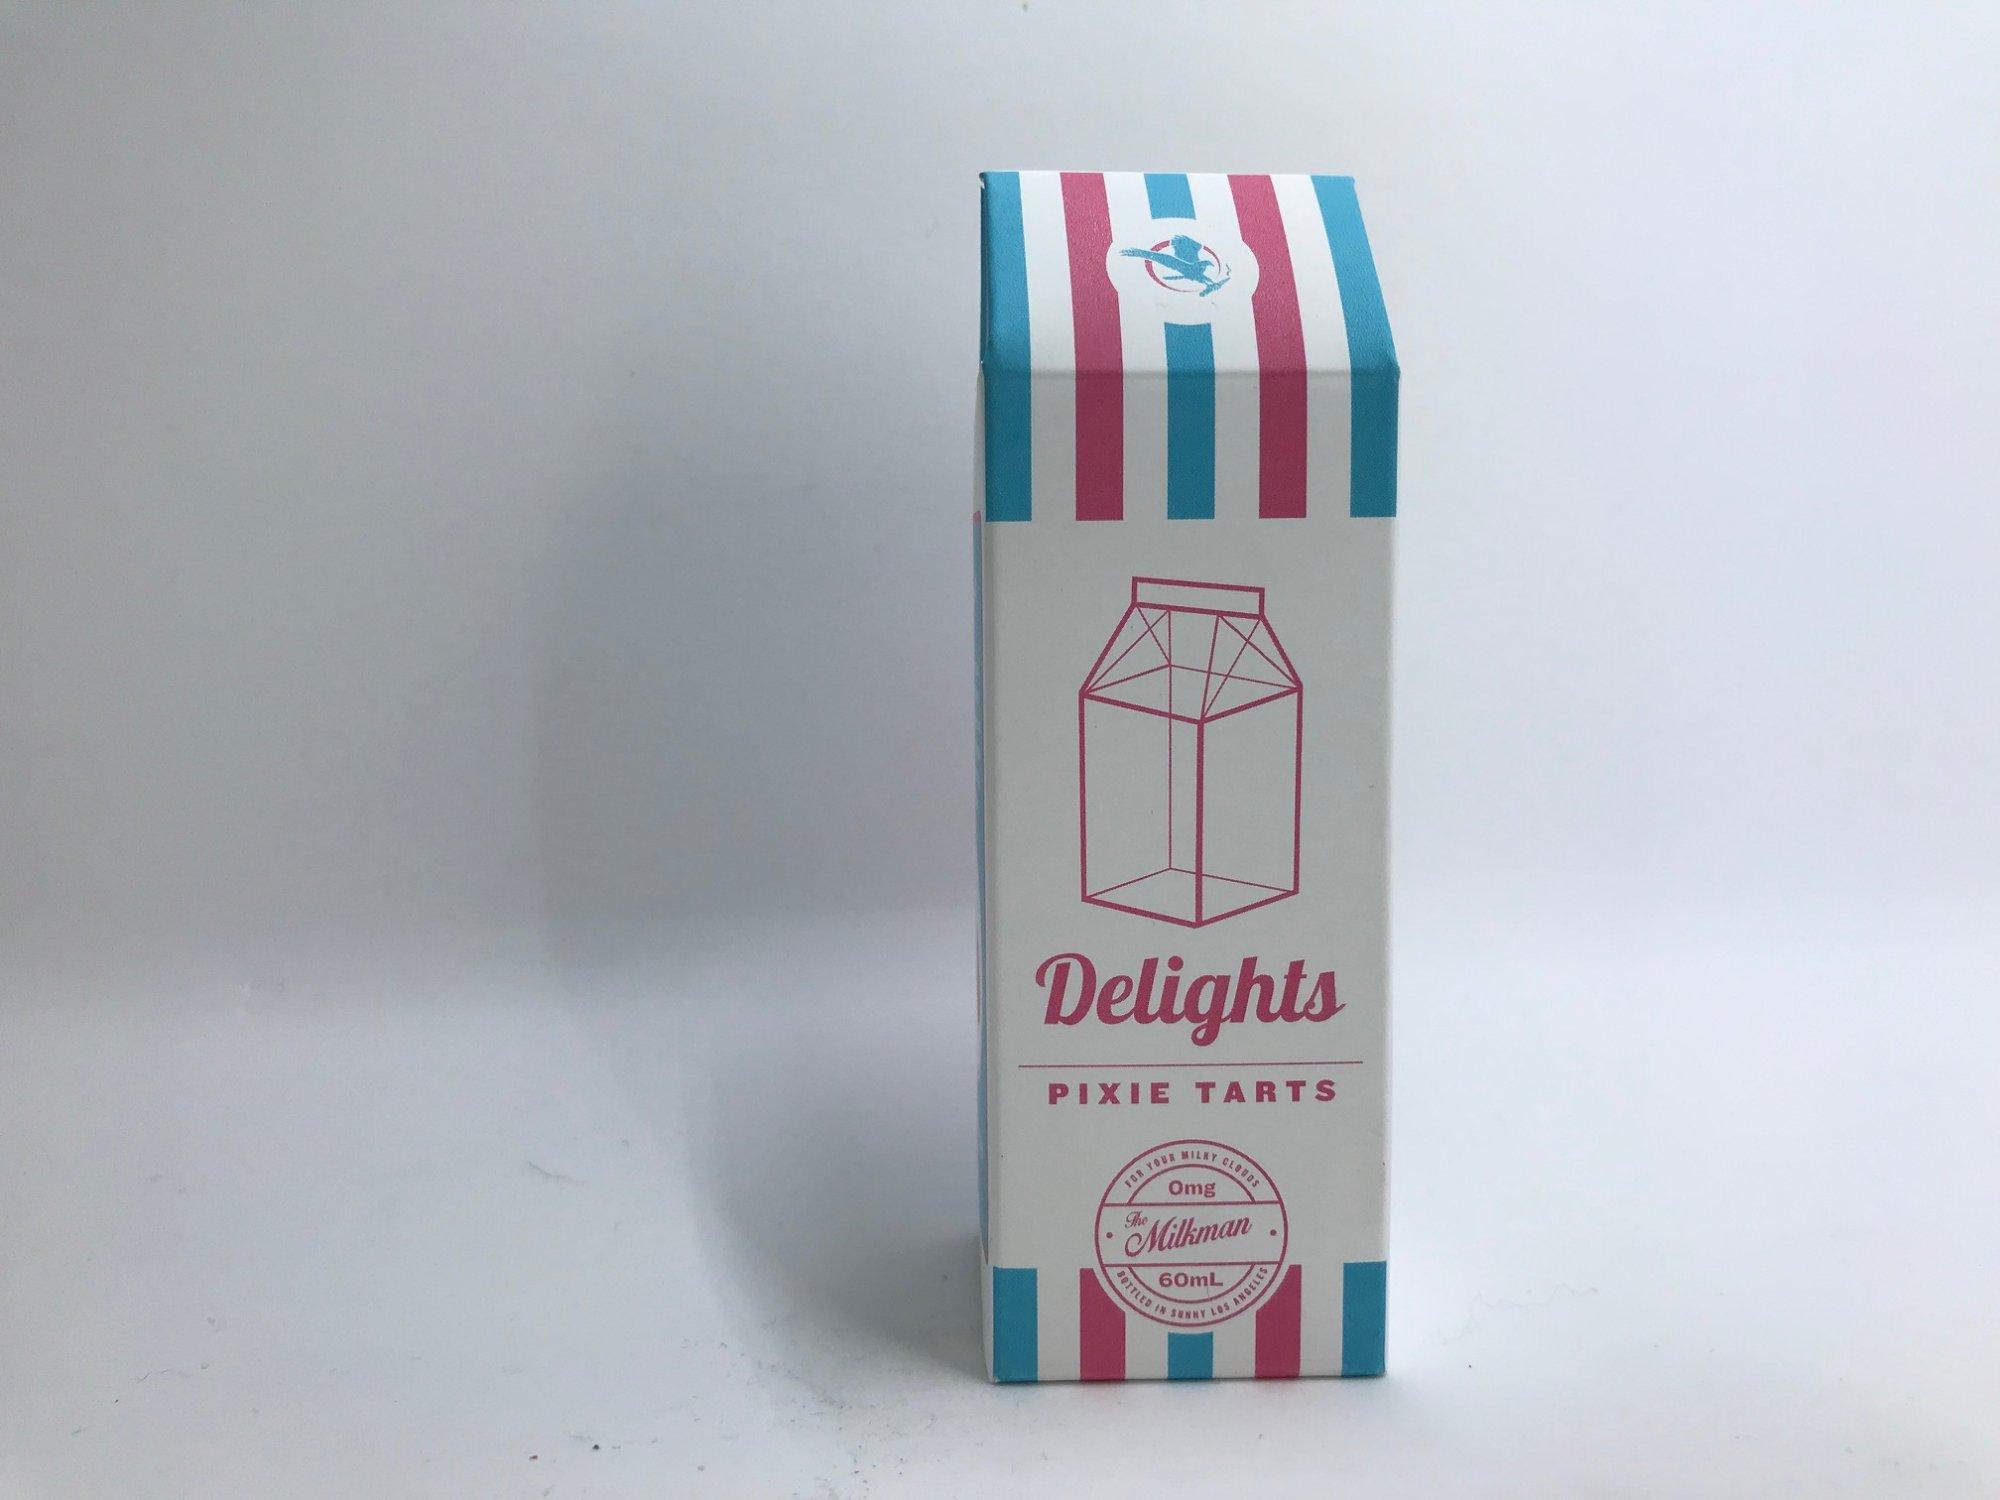 Milkman Delights Pixie Tarts eJuice